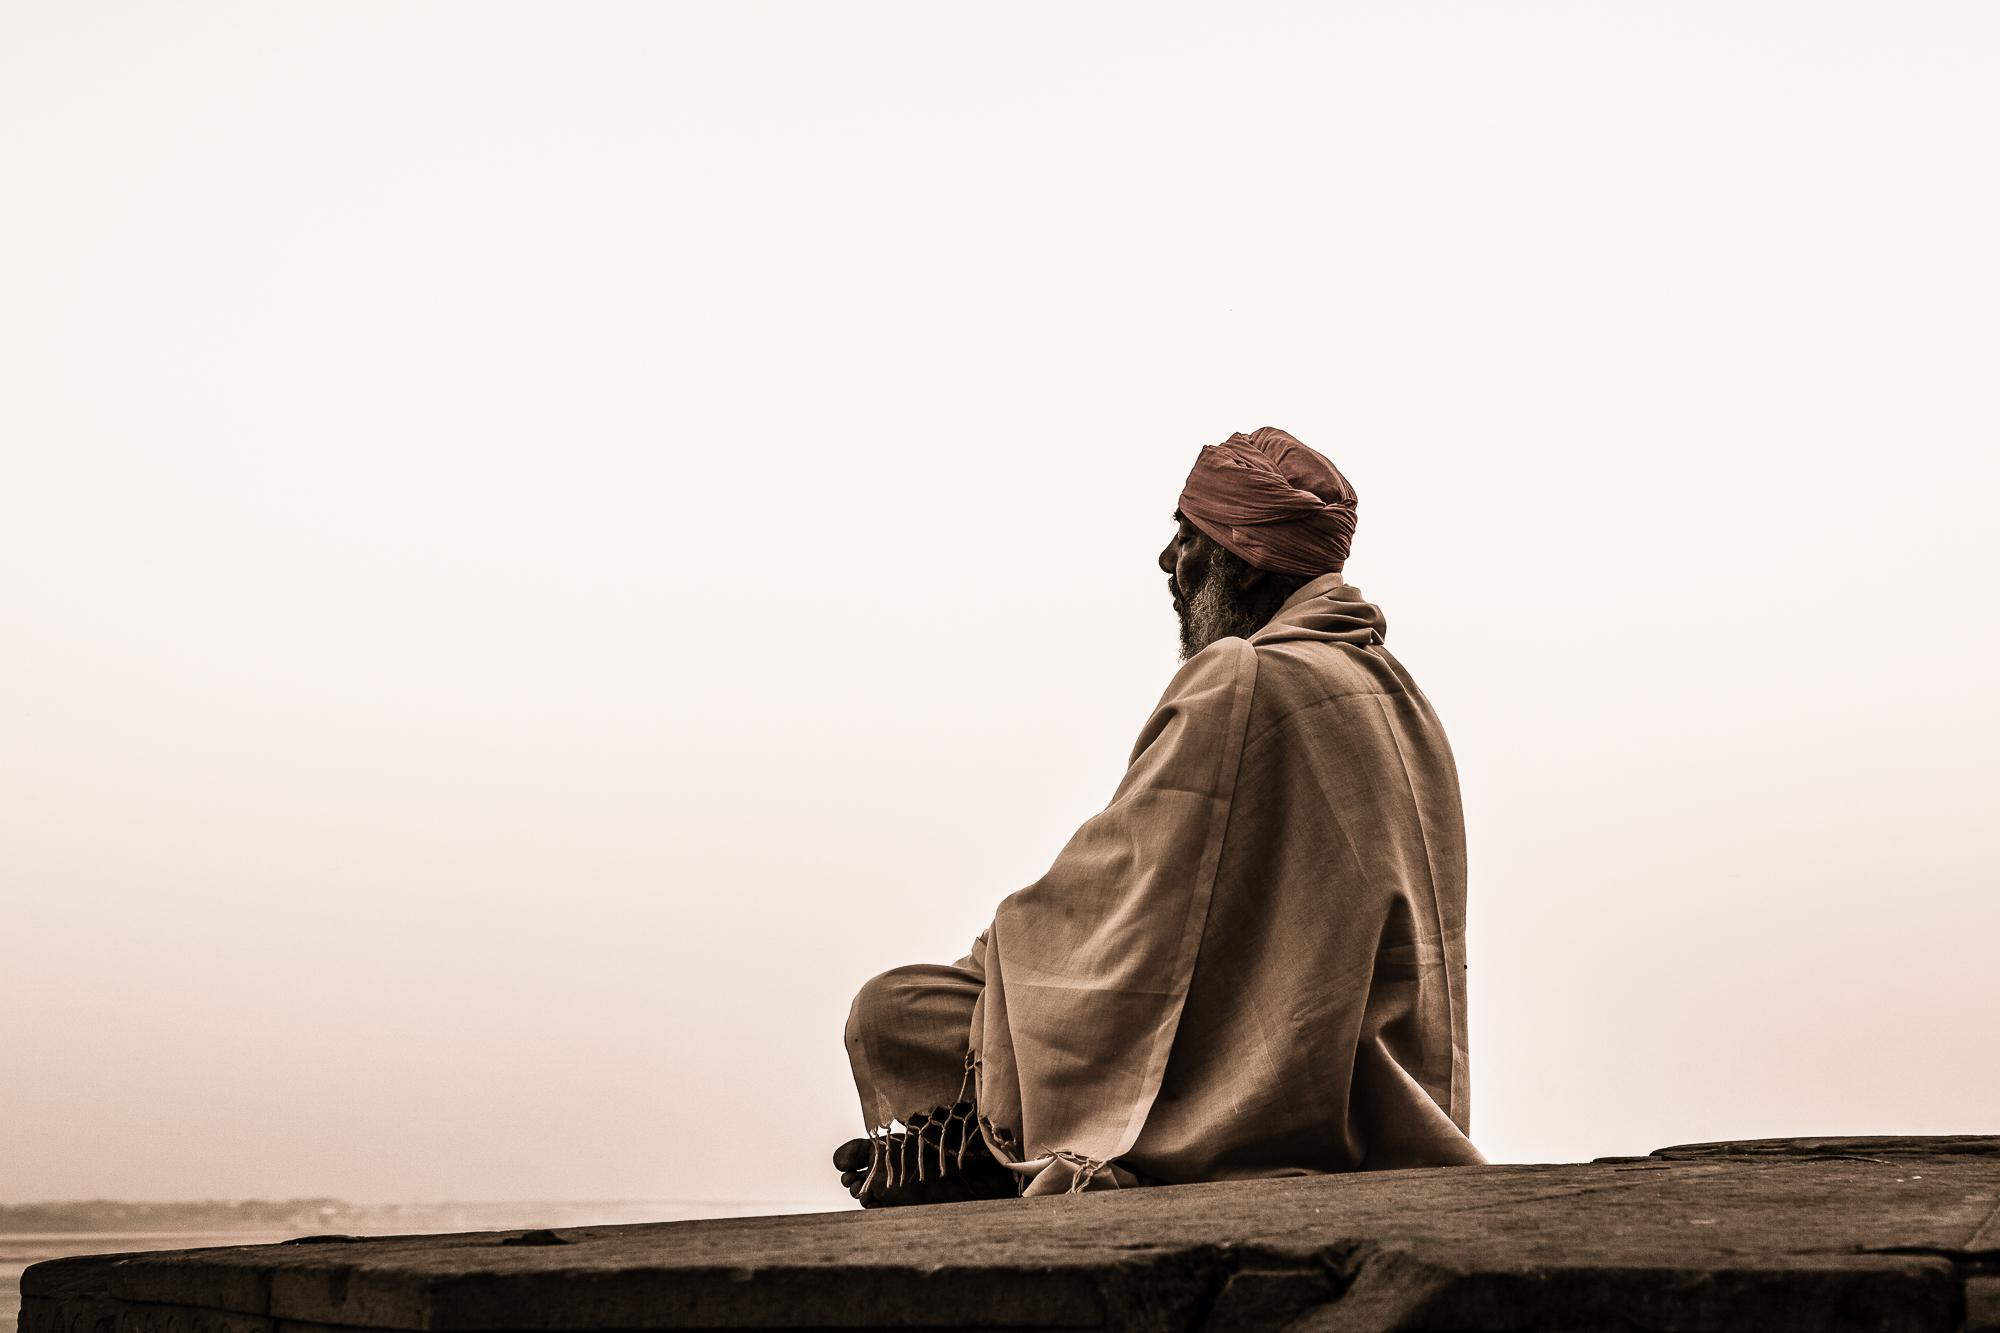 Resting above Ganges, India